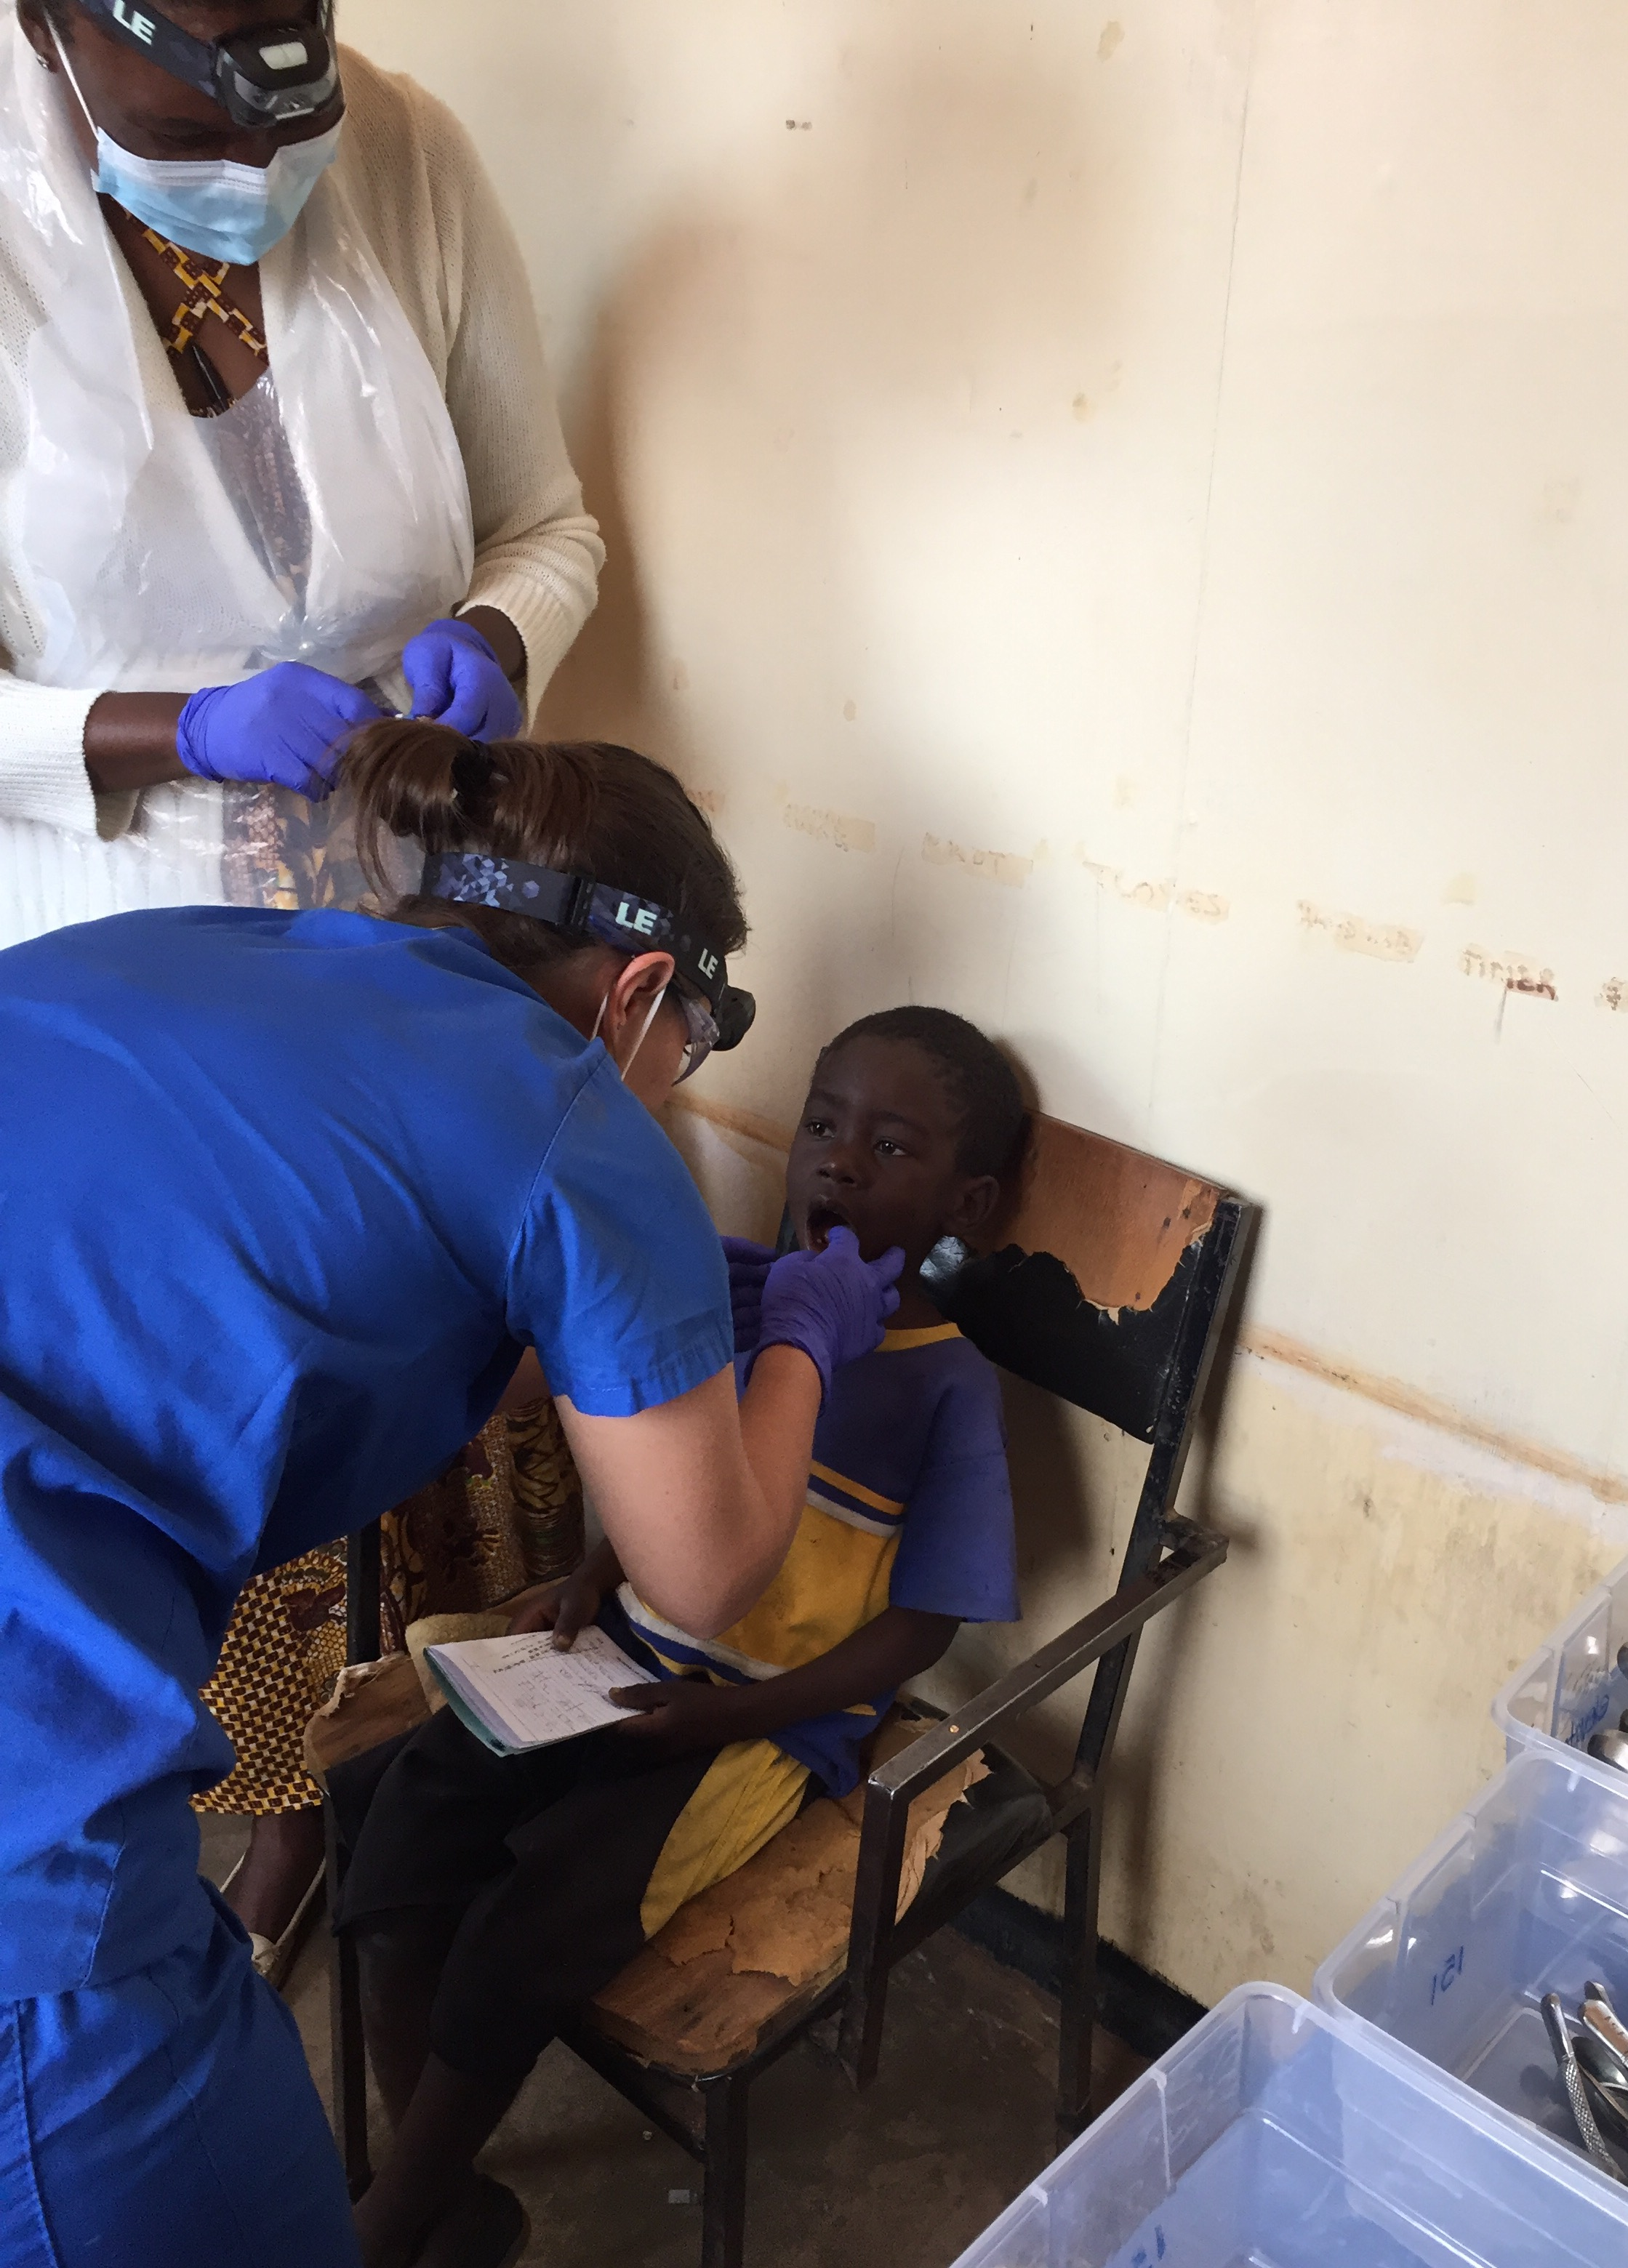 Dr. Jenn Mullarkey treats a patient at Dzaleka Refugee Camp on July 20, 2017